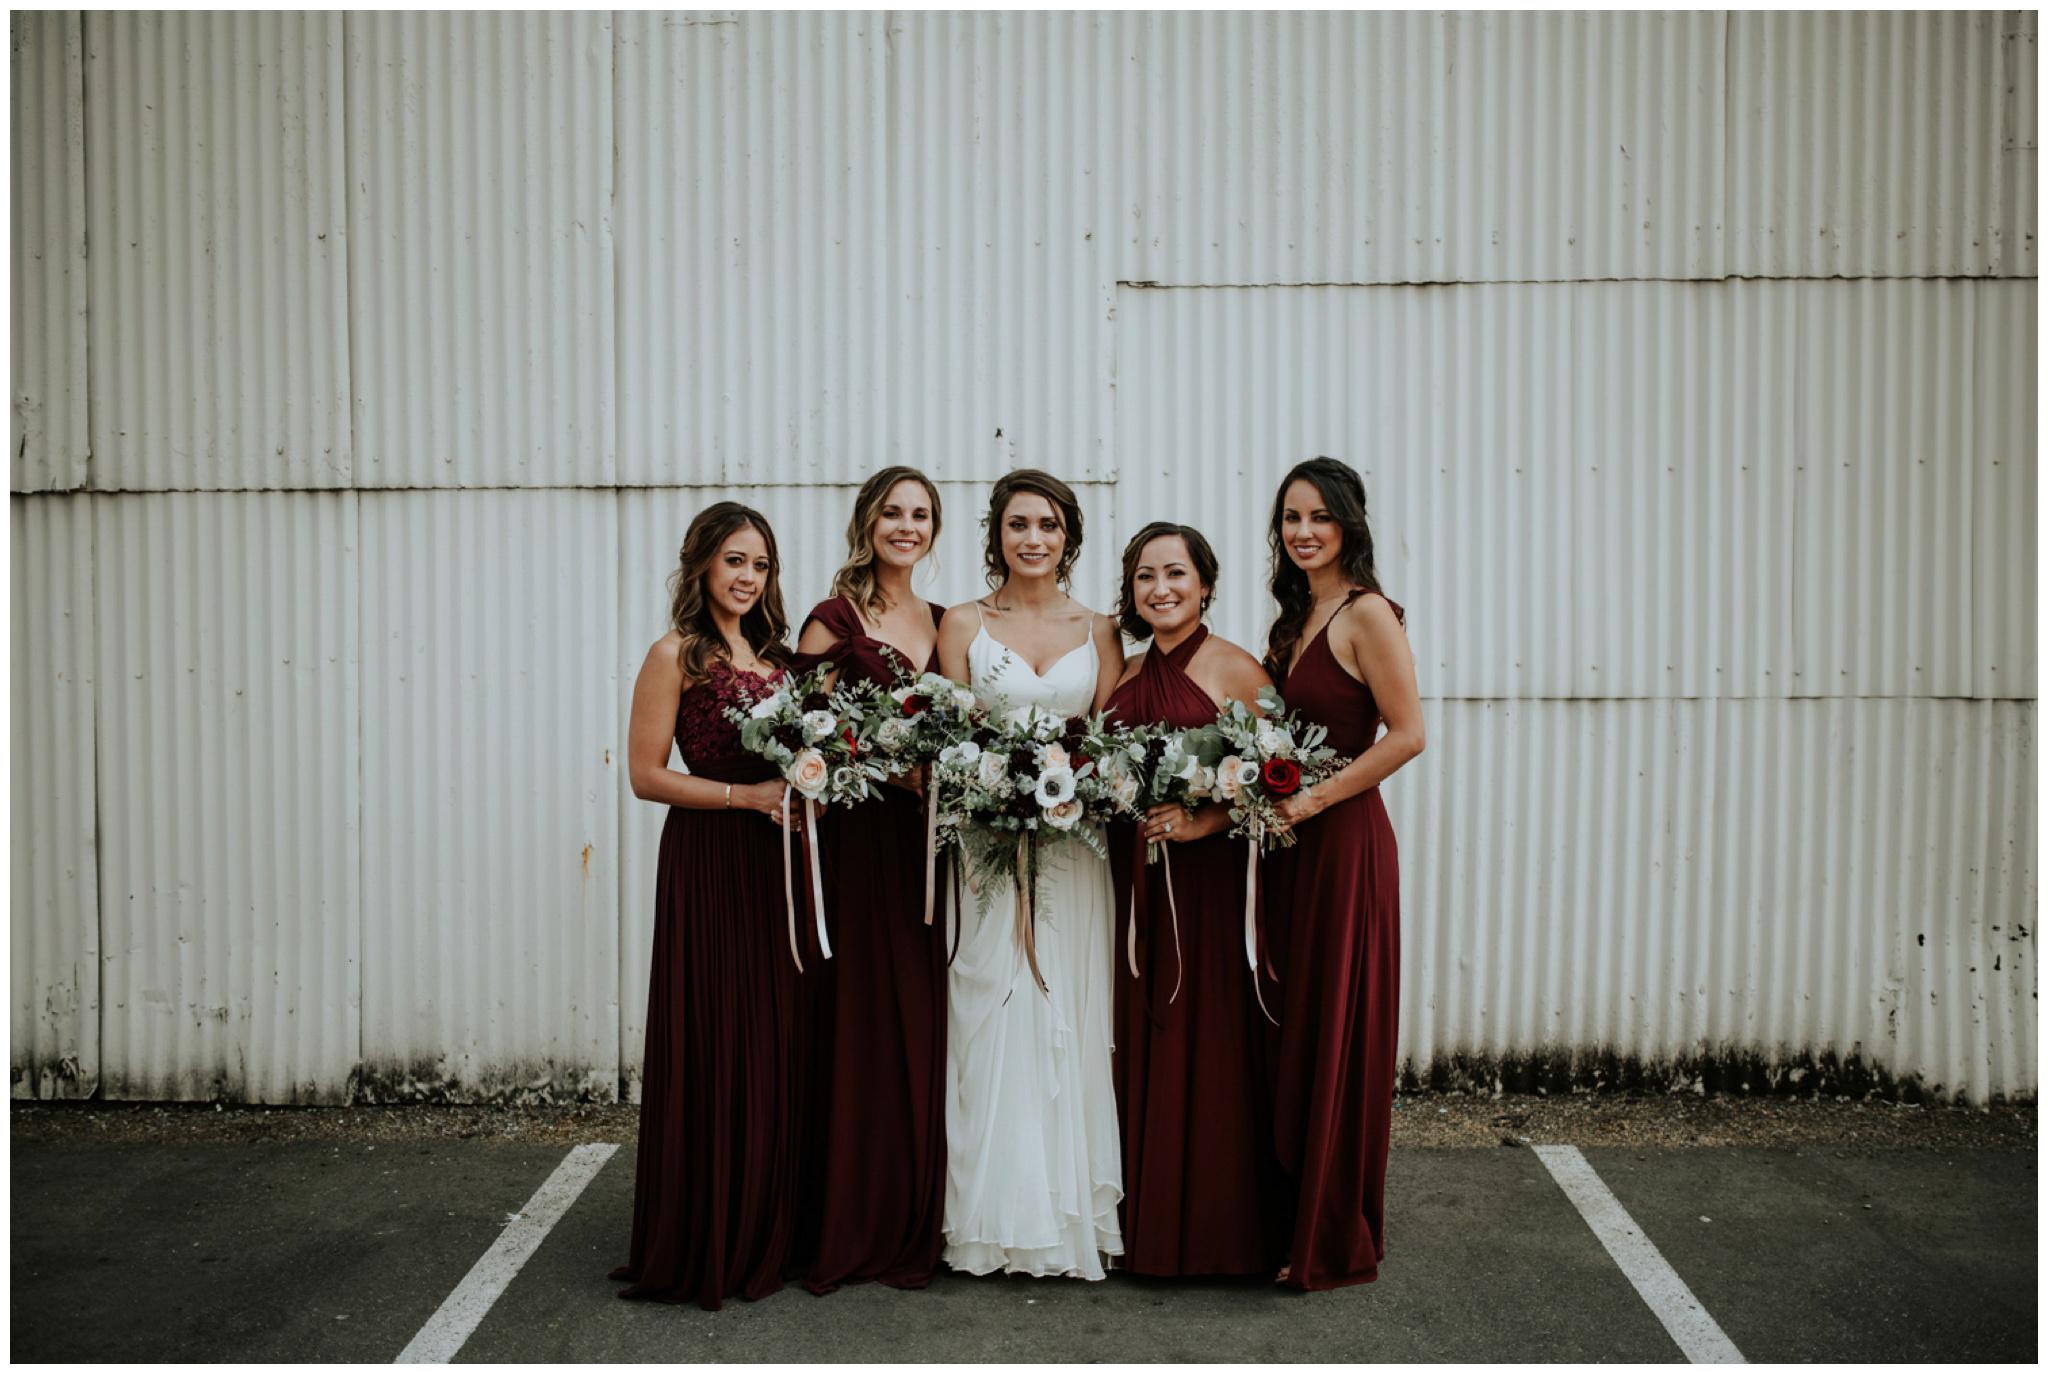 alyssa-keiran-westland-distillery-urban-seattle-wedding-photographer-caitlyn-nikula-83.jpg